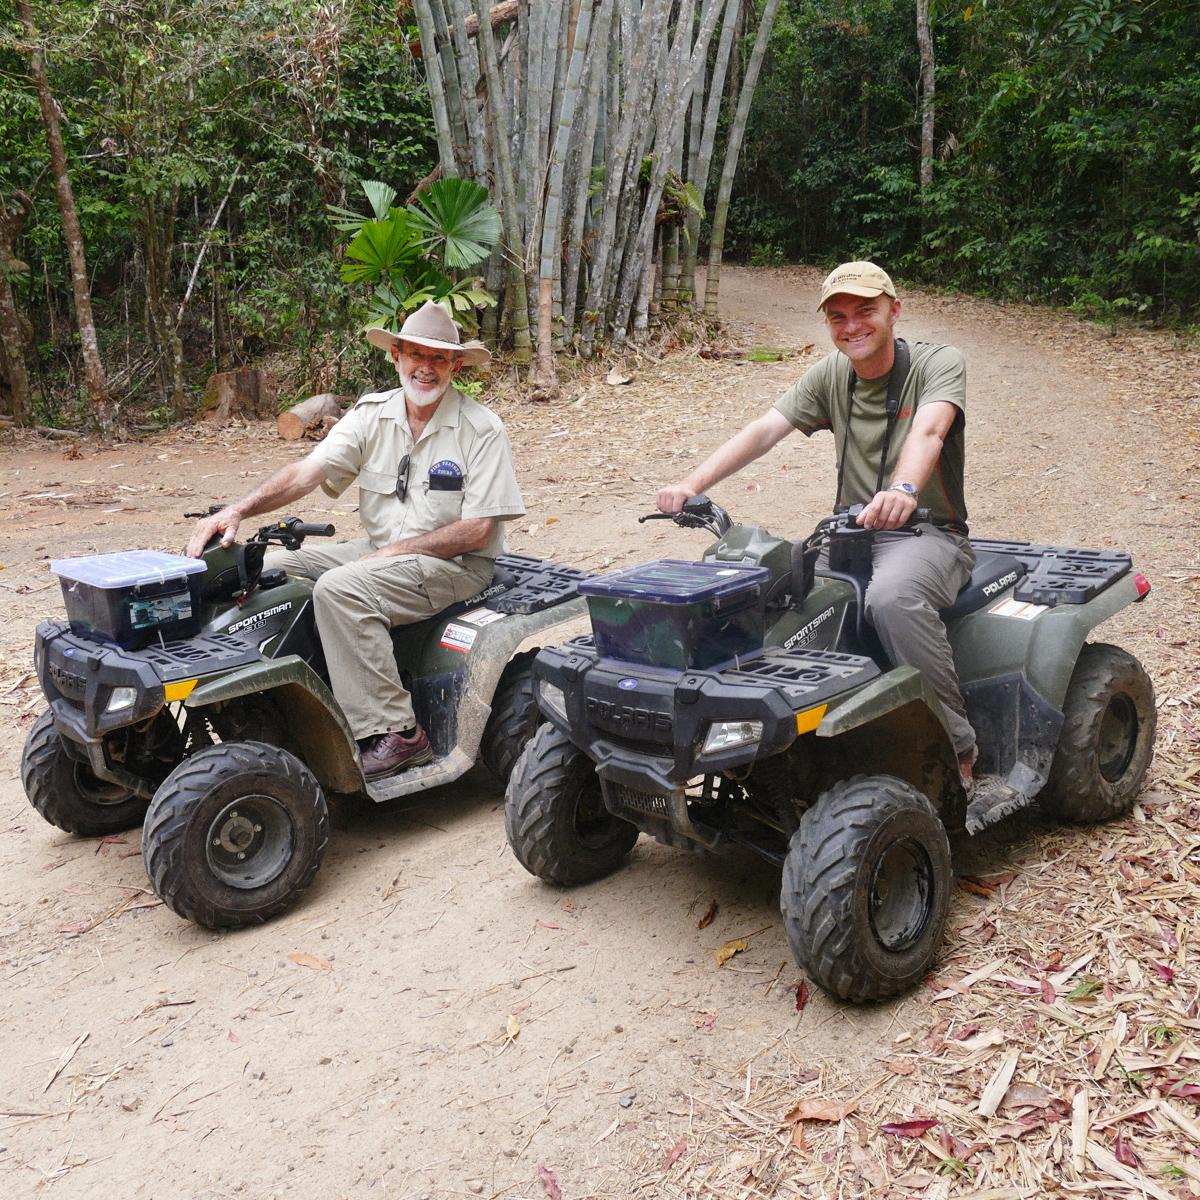 Del and Noah on their quad bikes. Noah Strycker